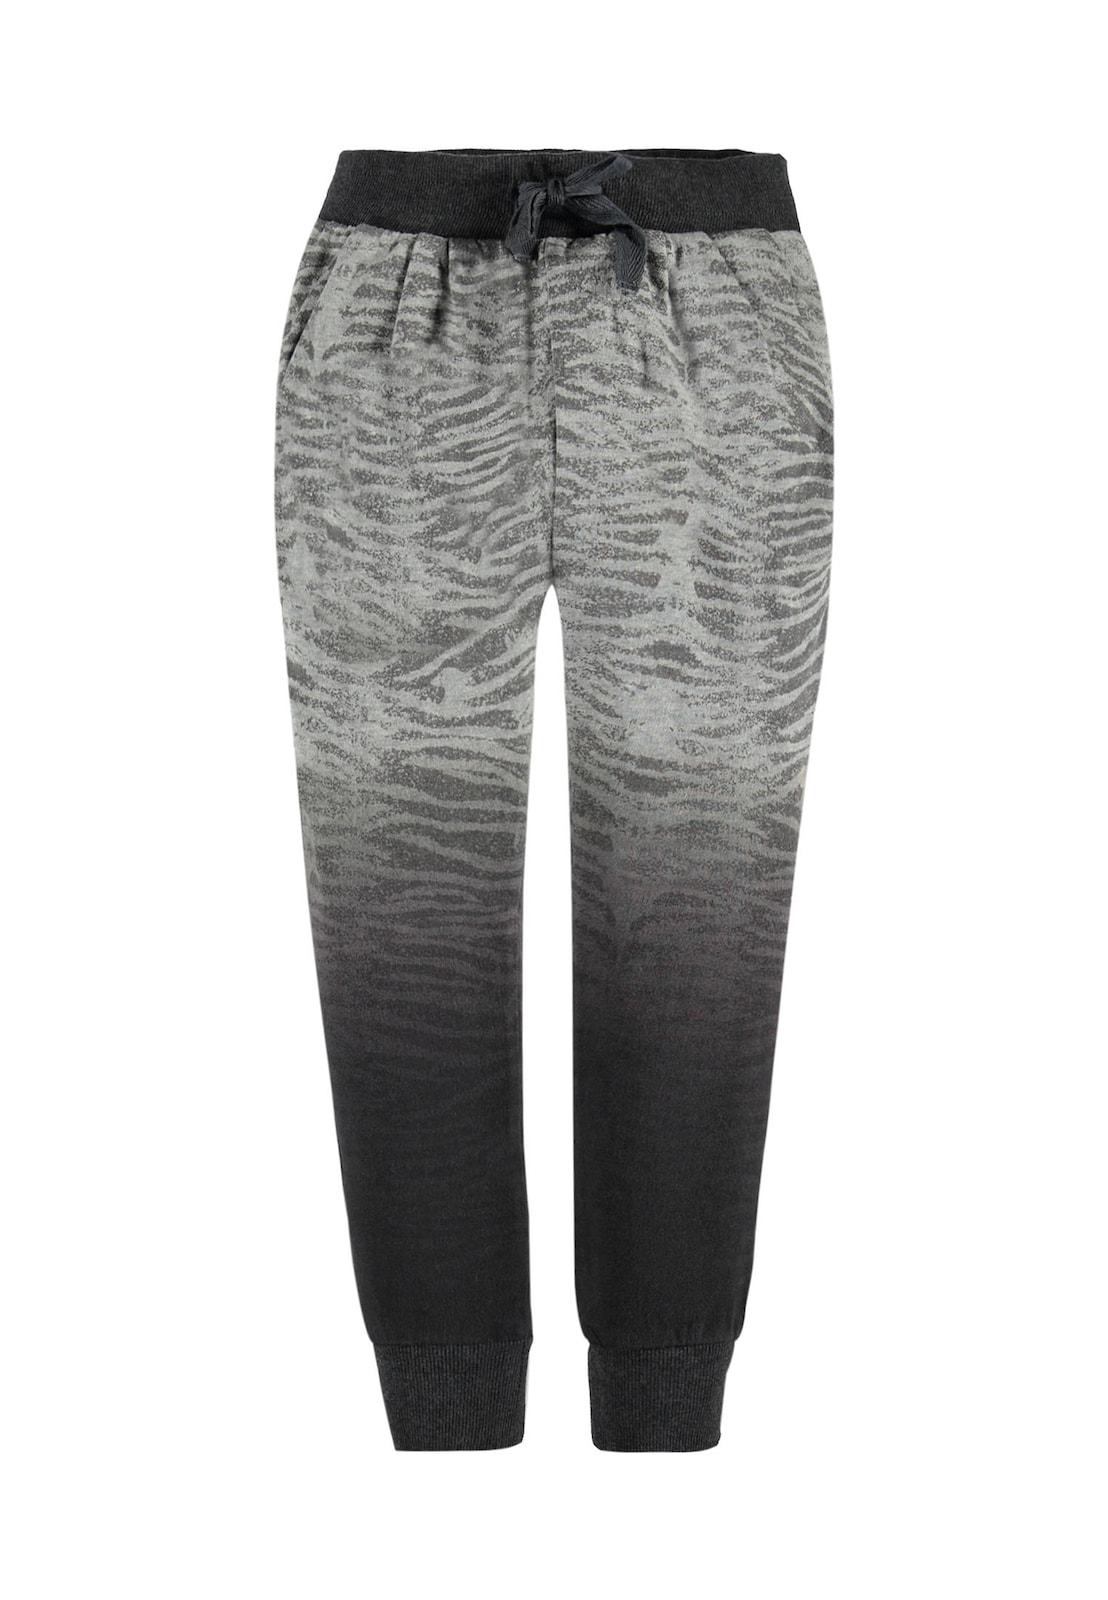 PAMPOLINA Jogg Pants Zebra-Print